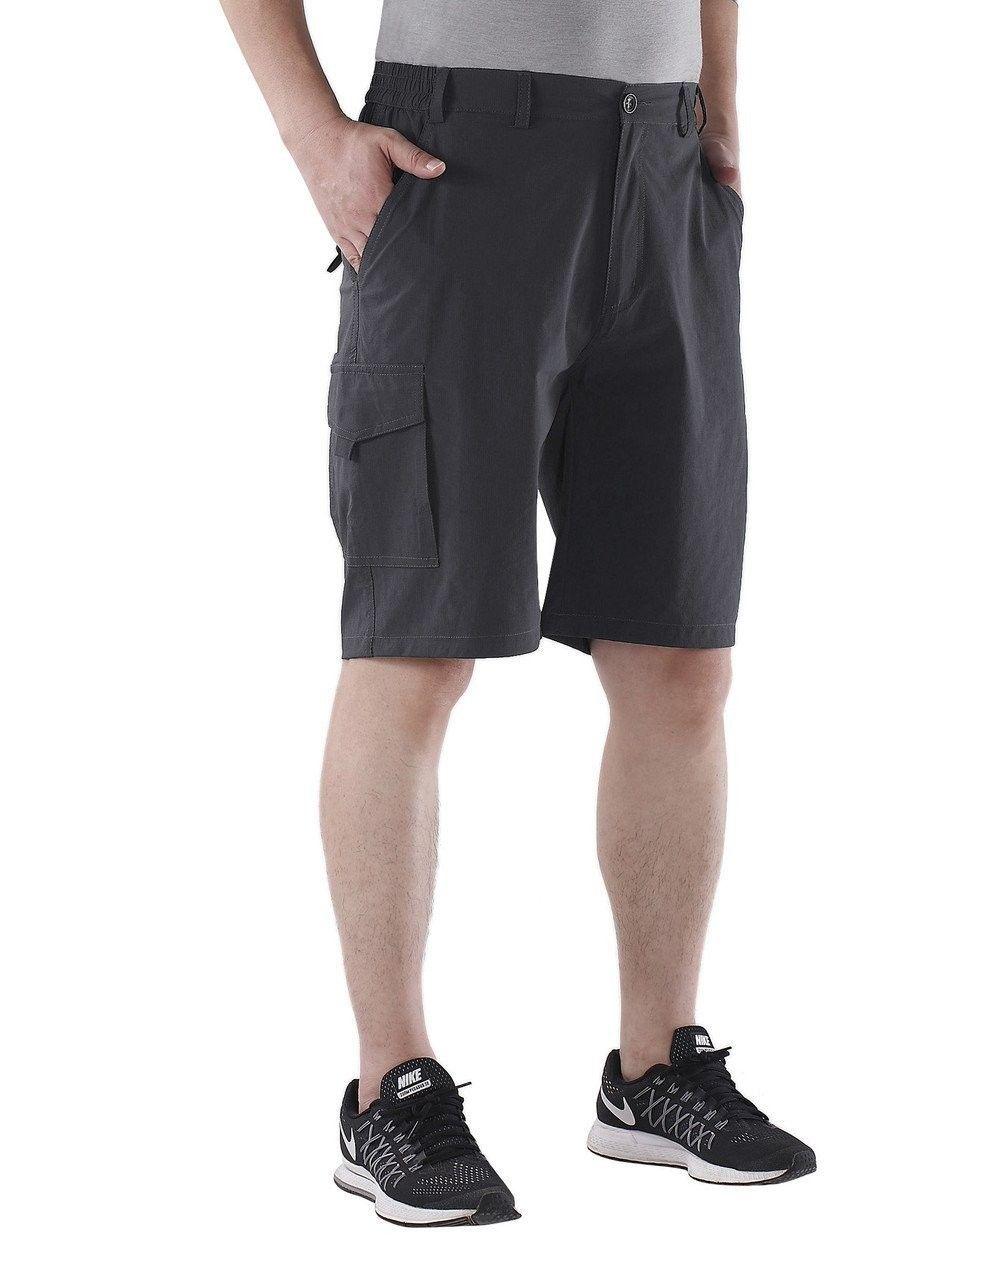 dcadf90bb0 Men's Outdoor Water-resistant Quick Dry Cargo Shorts - Gray (with zipper  pocket) - CB12O44INHI - Men's Clothing, Active, Active Pants #ActivePants # Men's ...